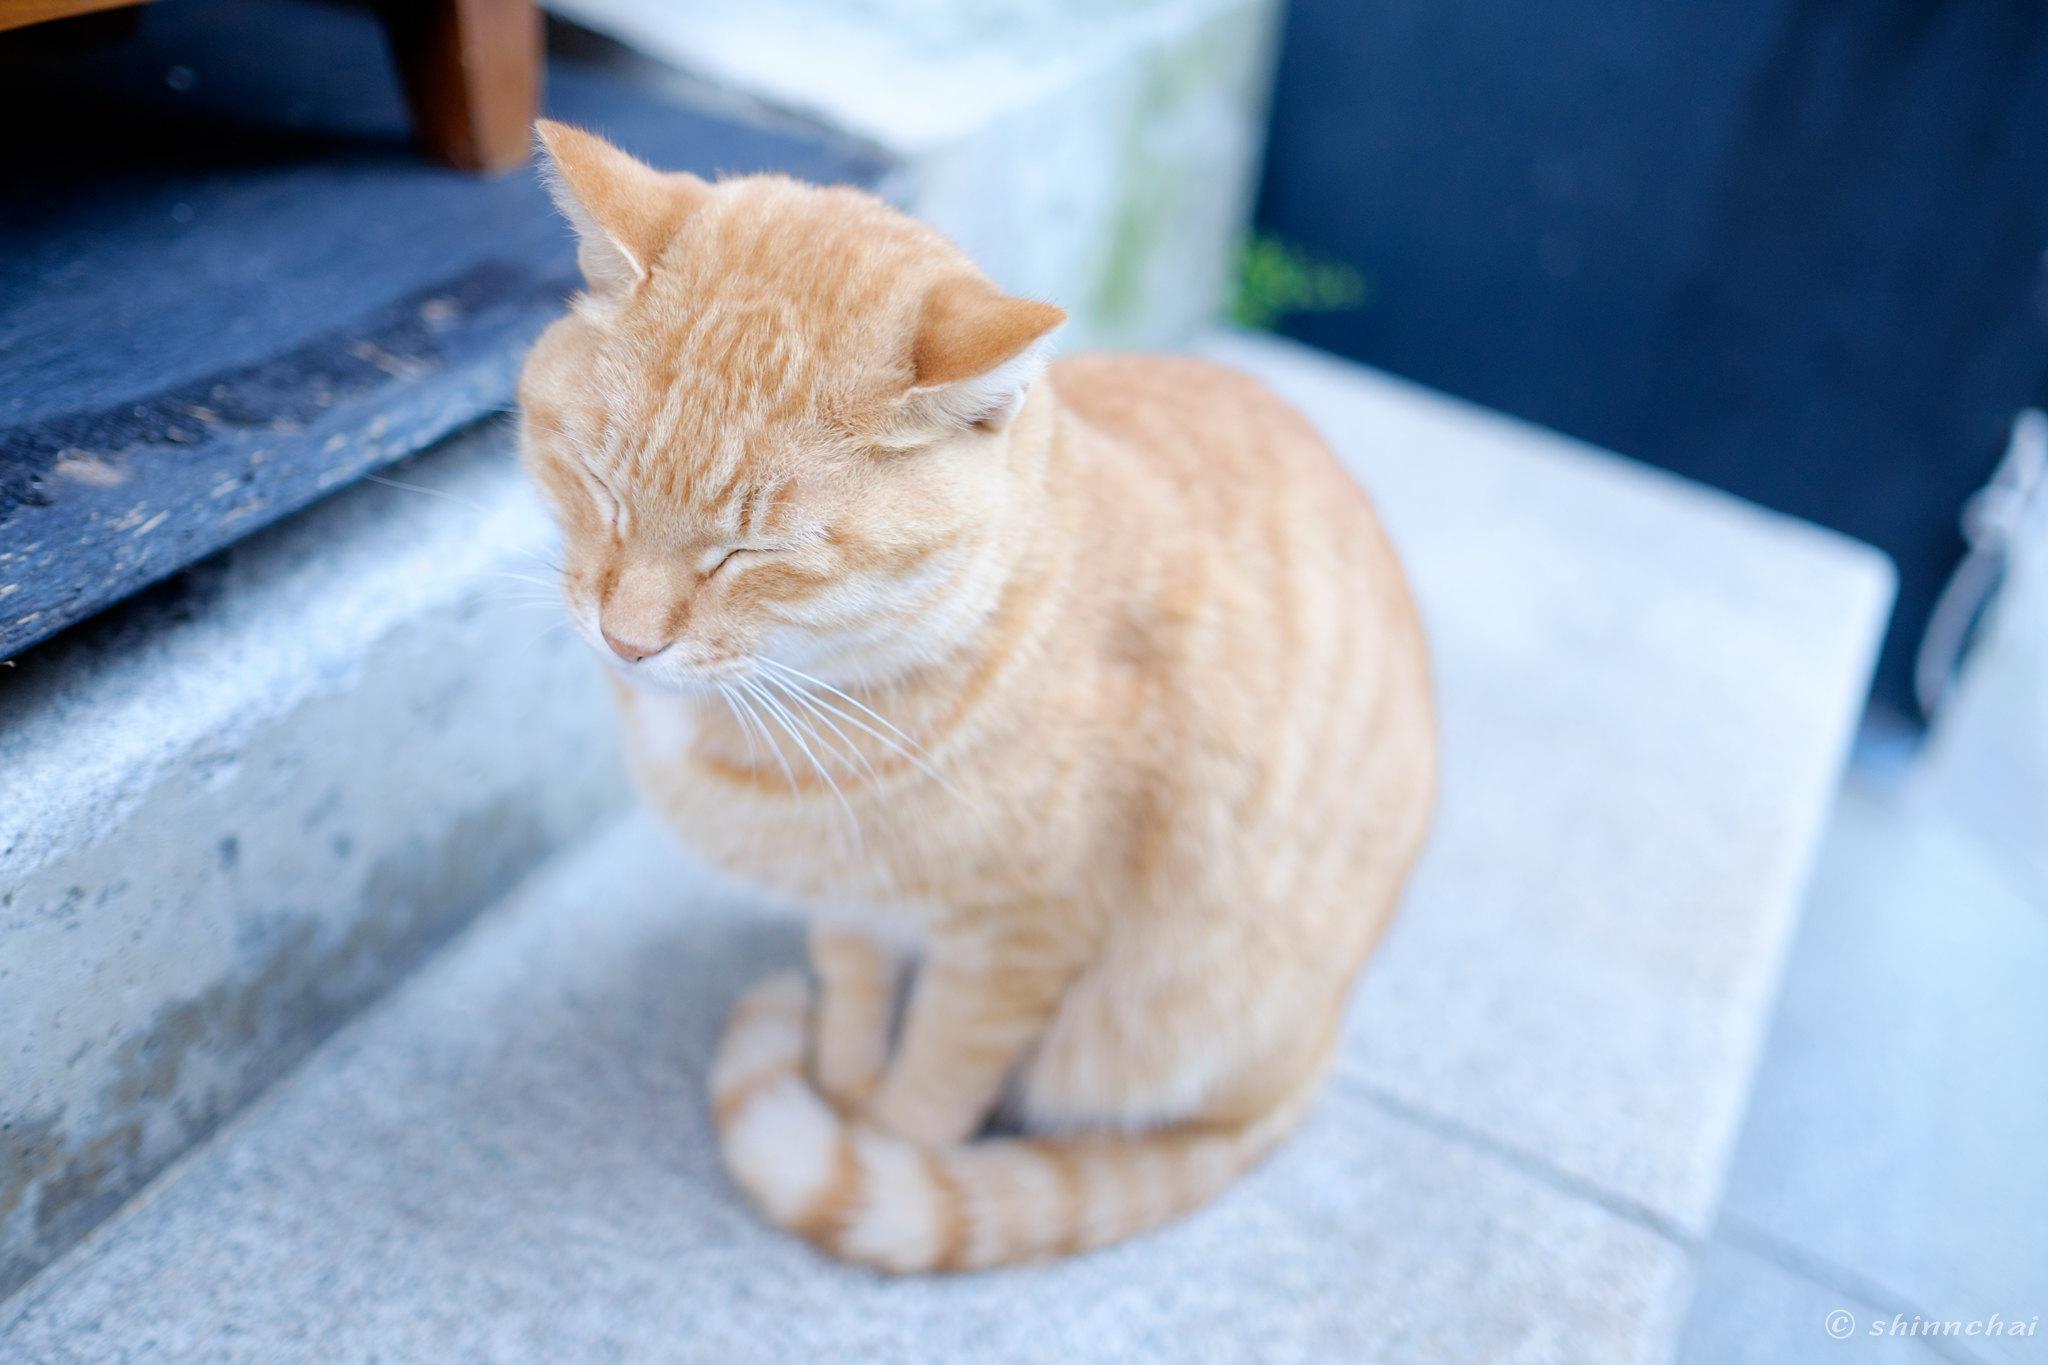 xf23mm f1.4 rの作例 レビュー 画質 江ノ島 猫